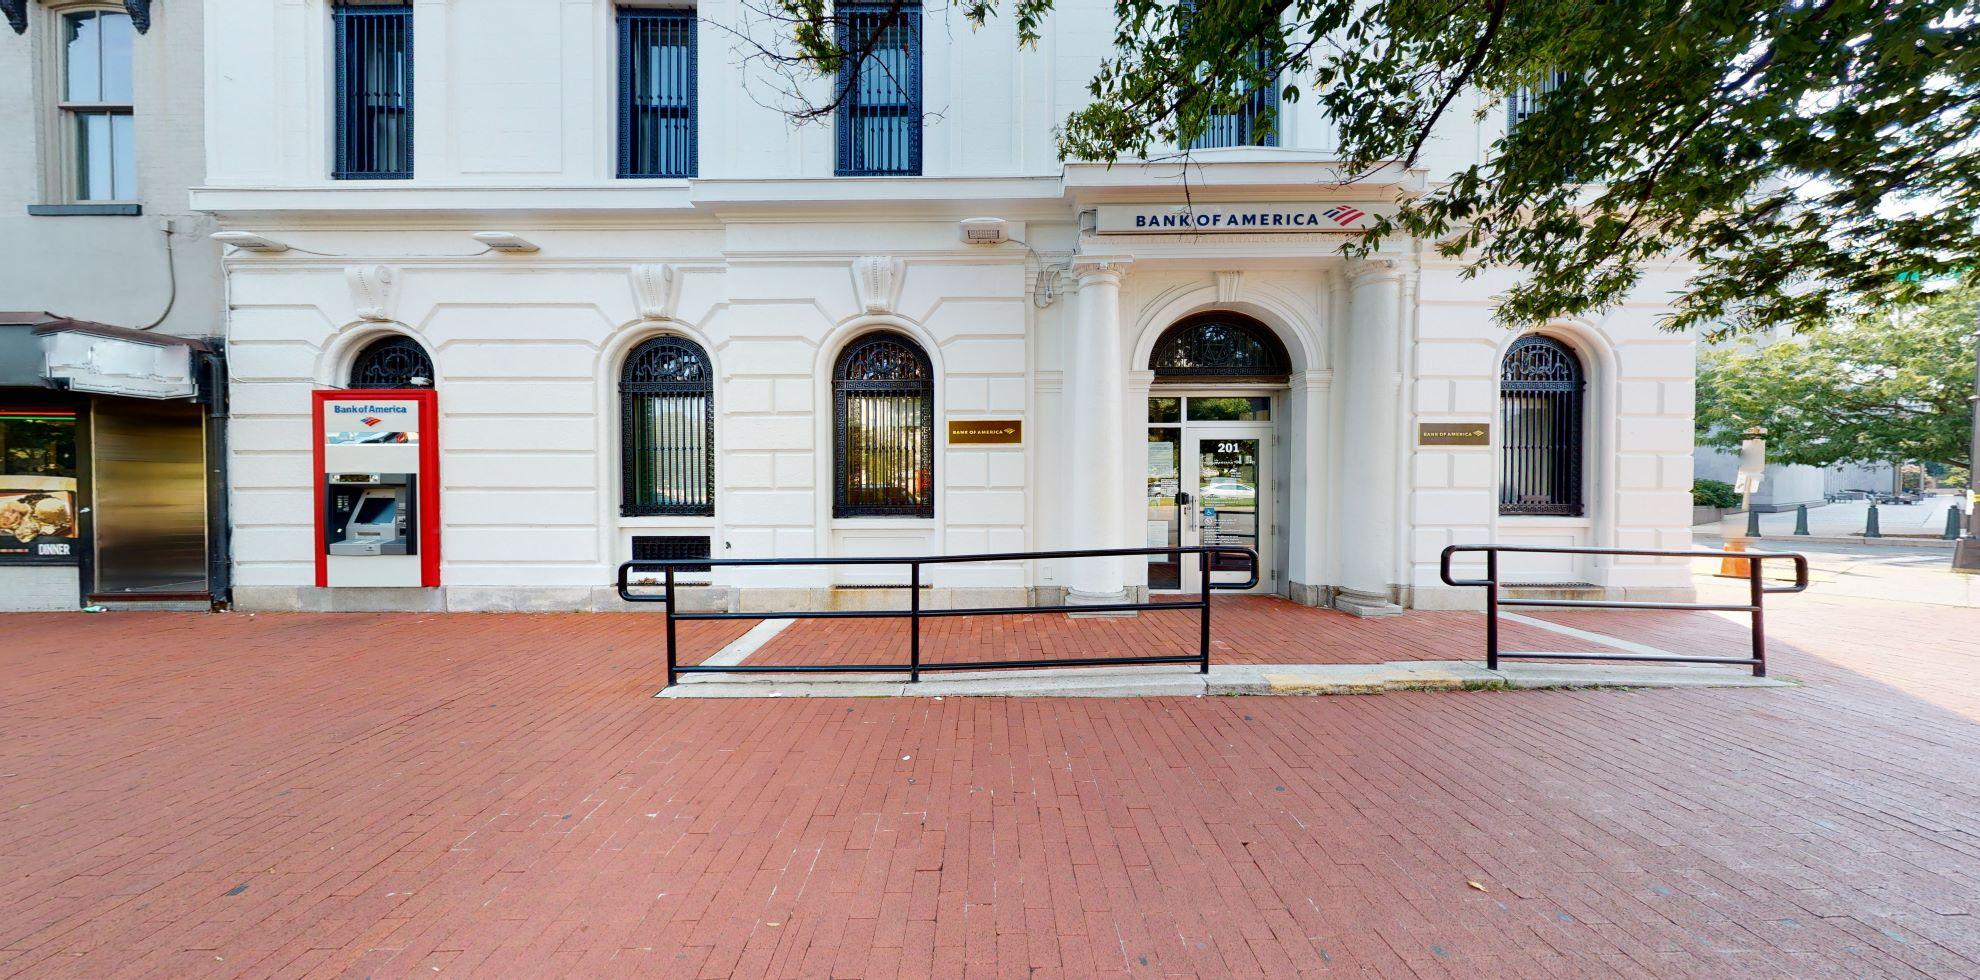 Bank of America financial center with walk-up ATM   201 Pennsylvania Ave SE, Washington, DC 20003